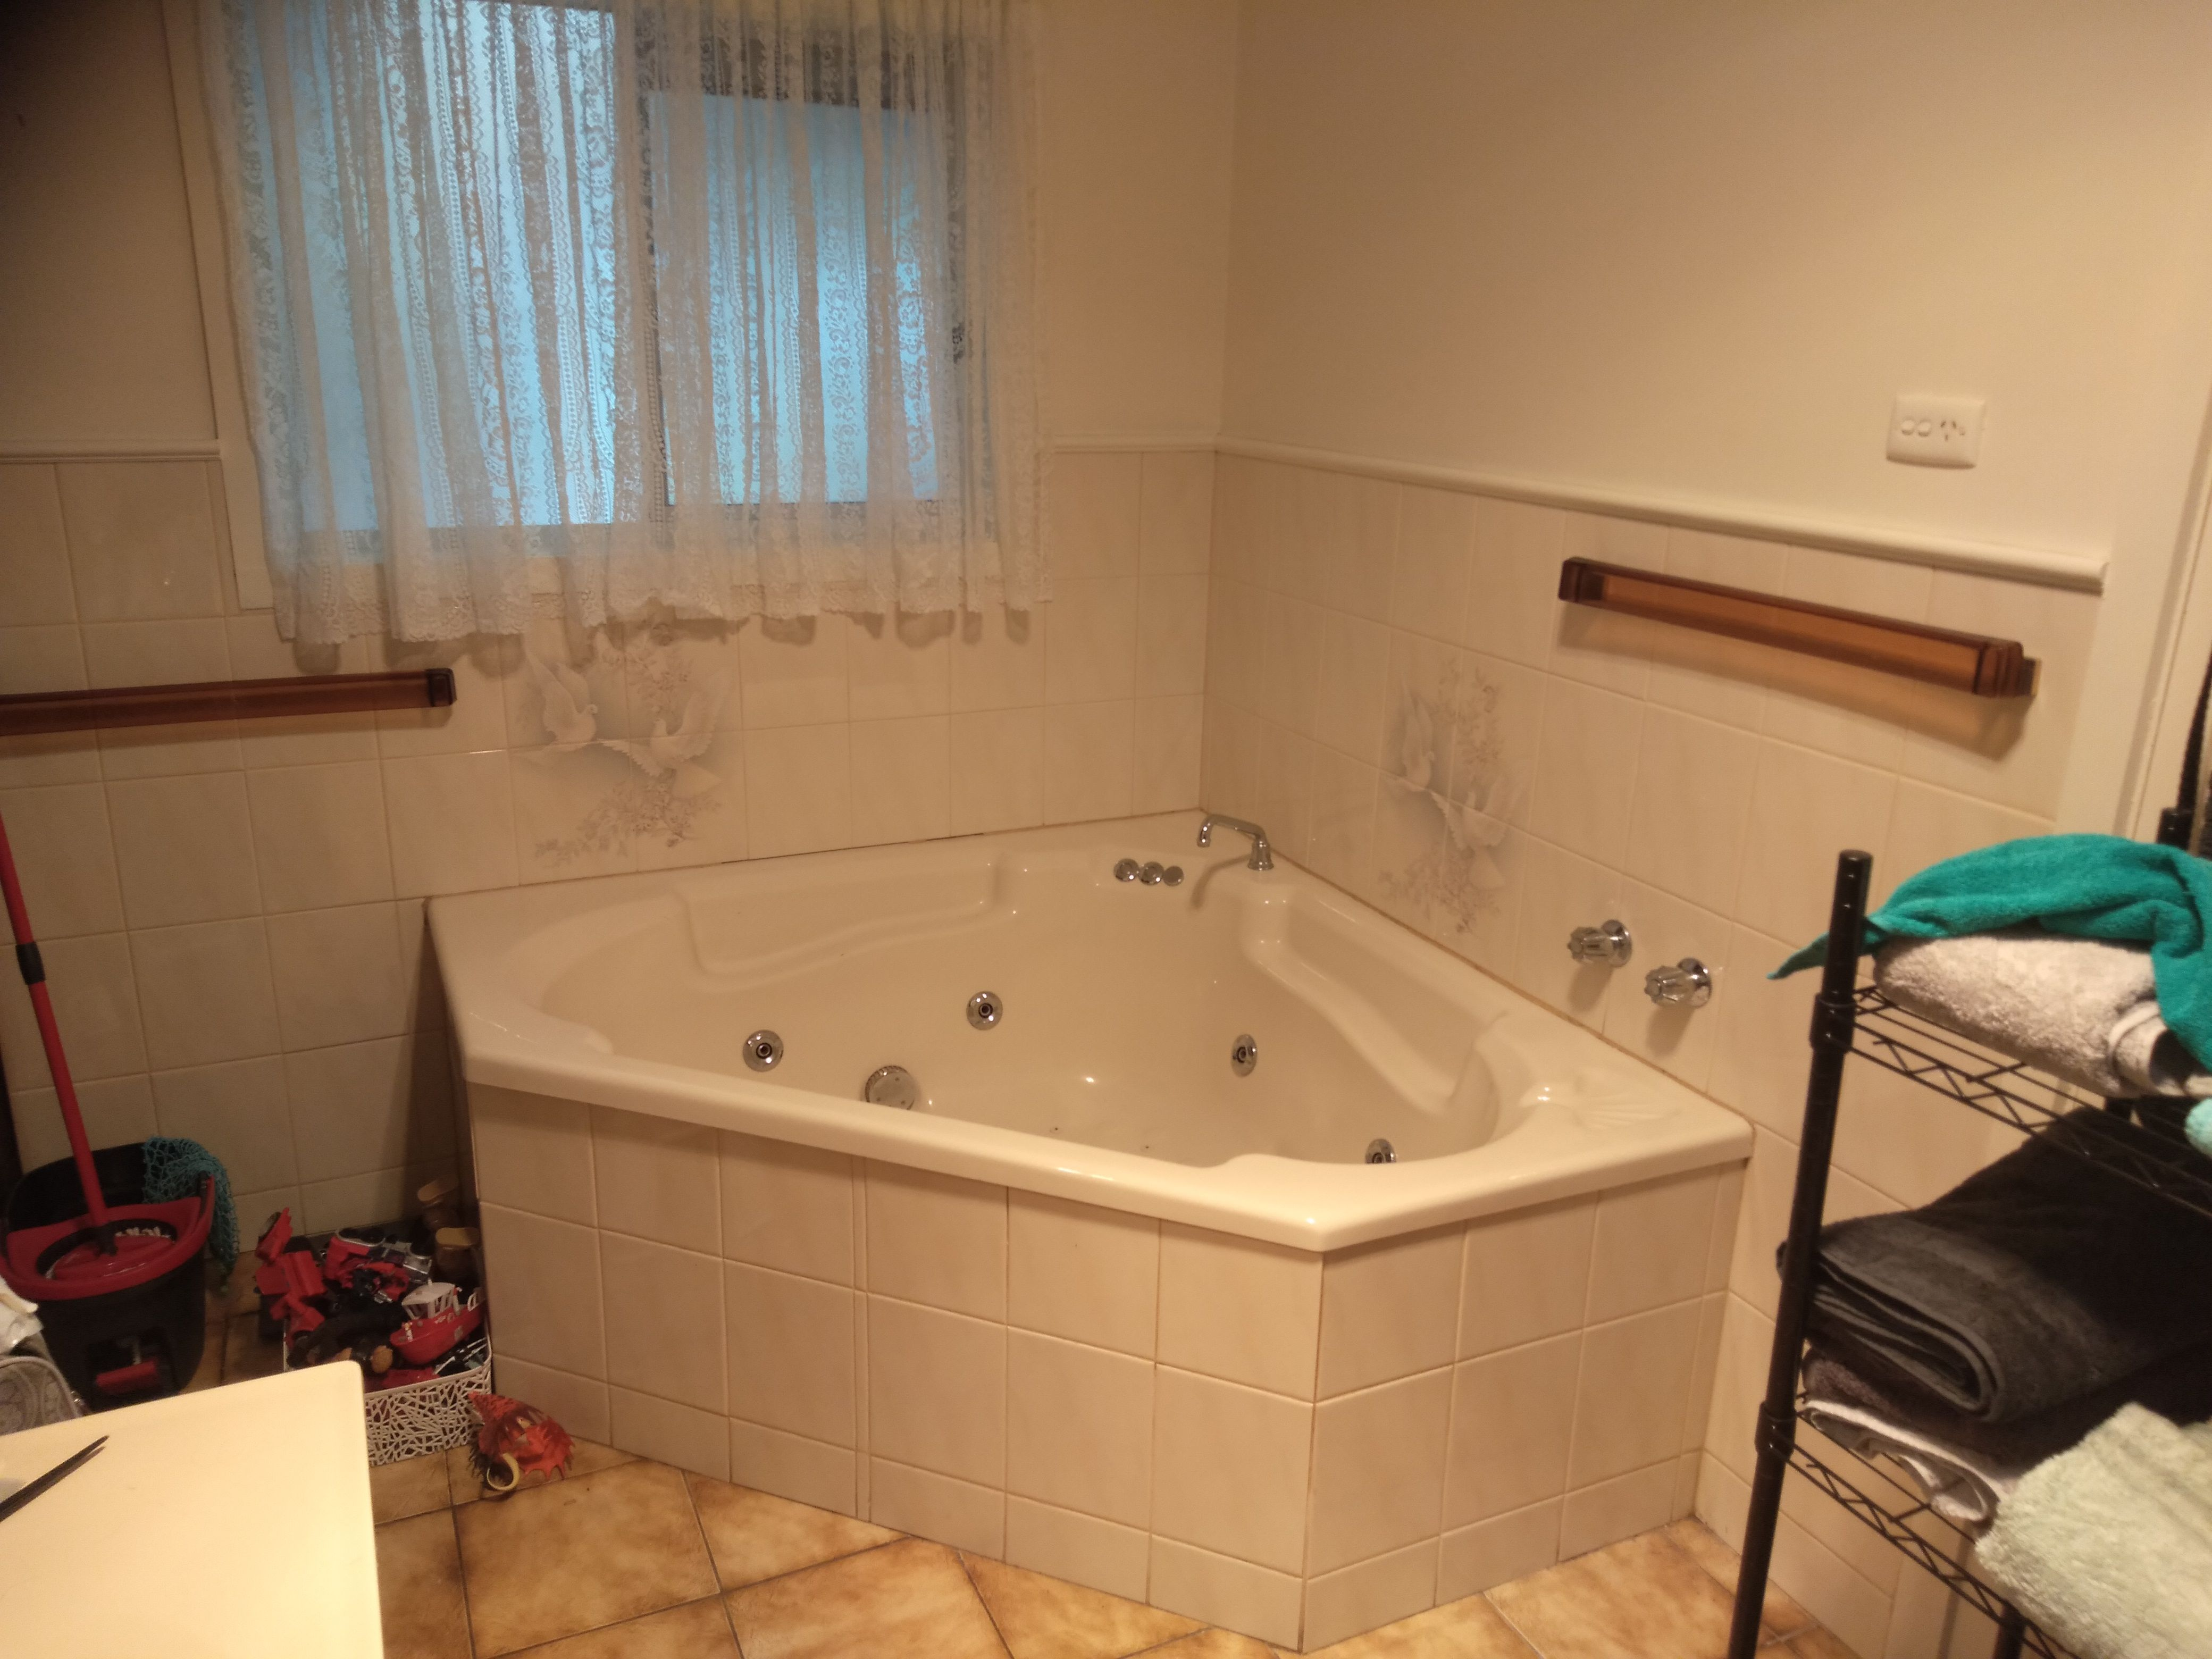 Bathroom tile paint | Bunnings Workshop Community